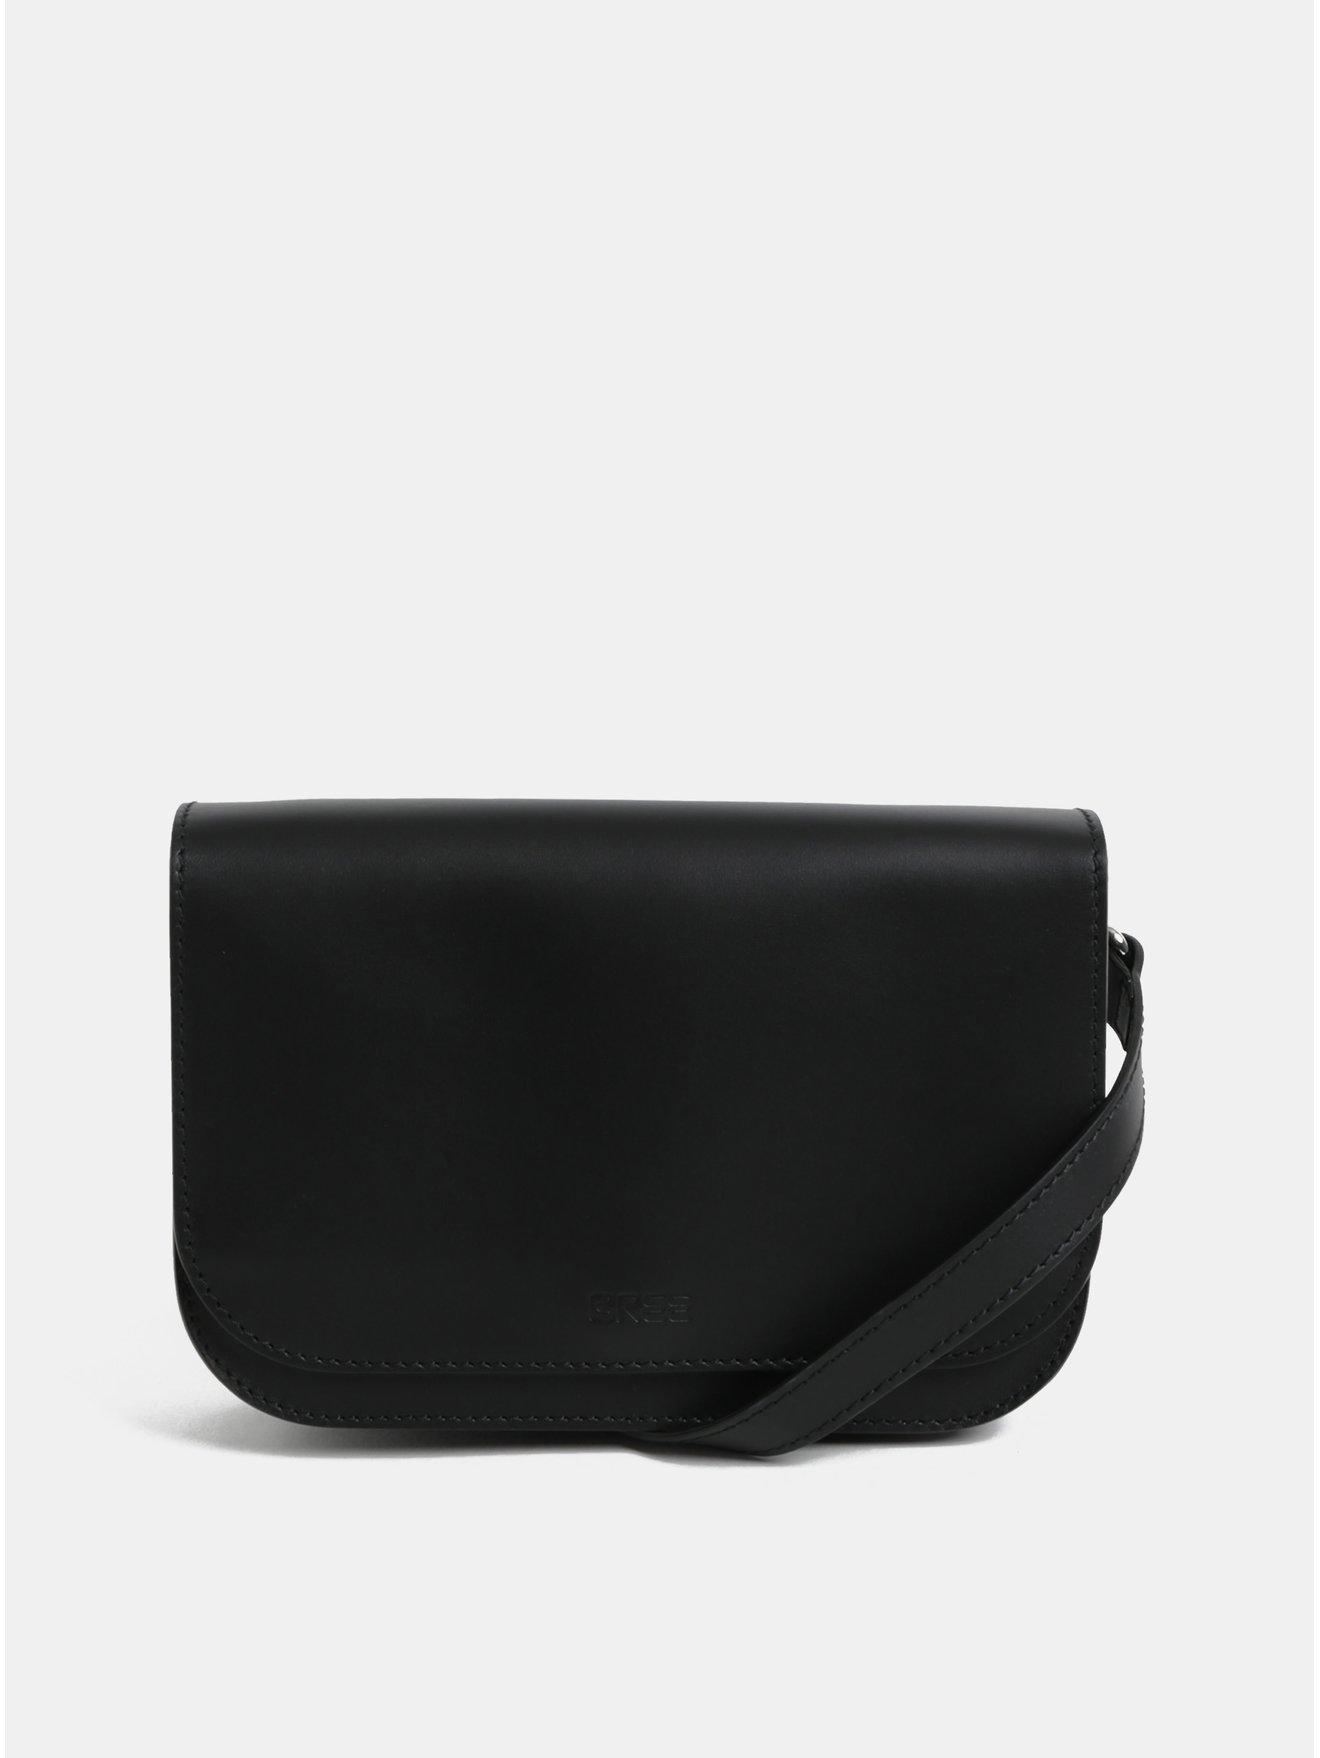 Černá kožená malá crossbody kabelka BREE Cambridge 15